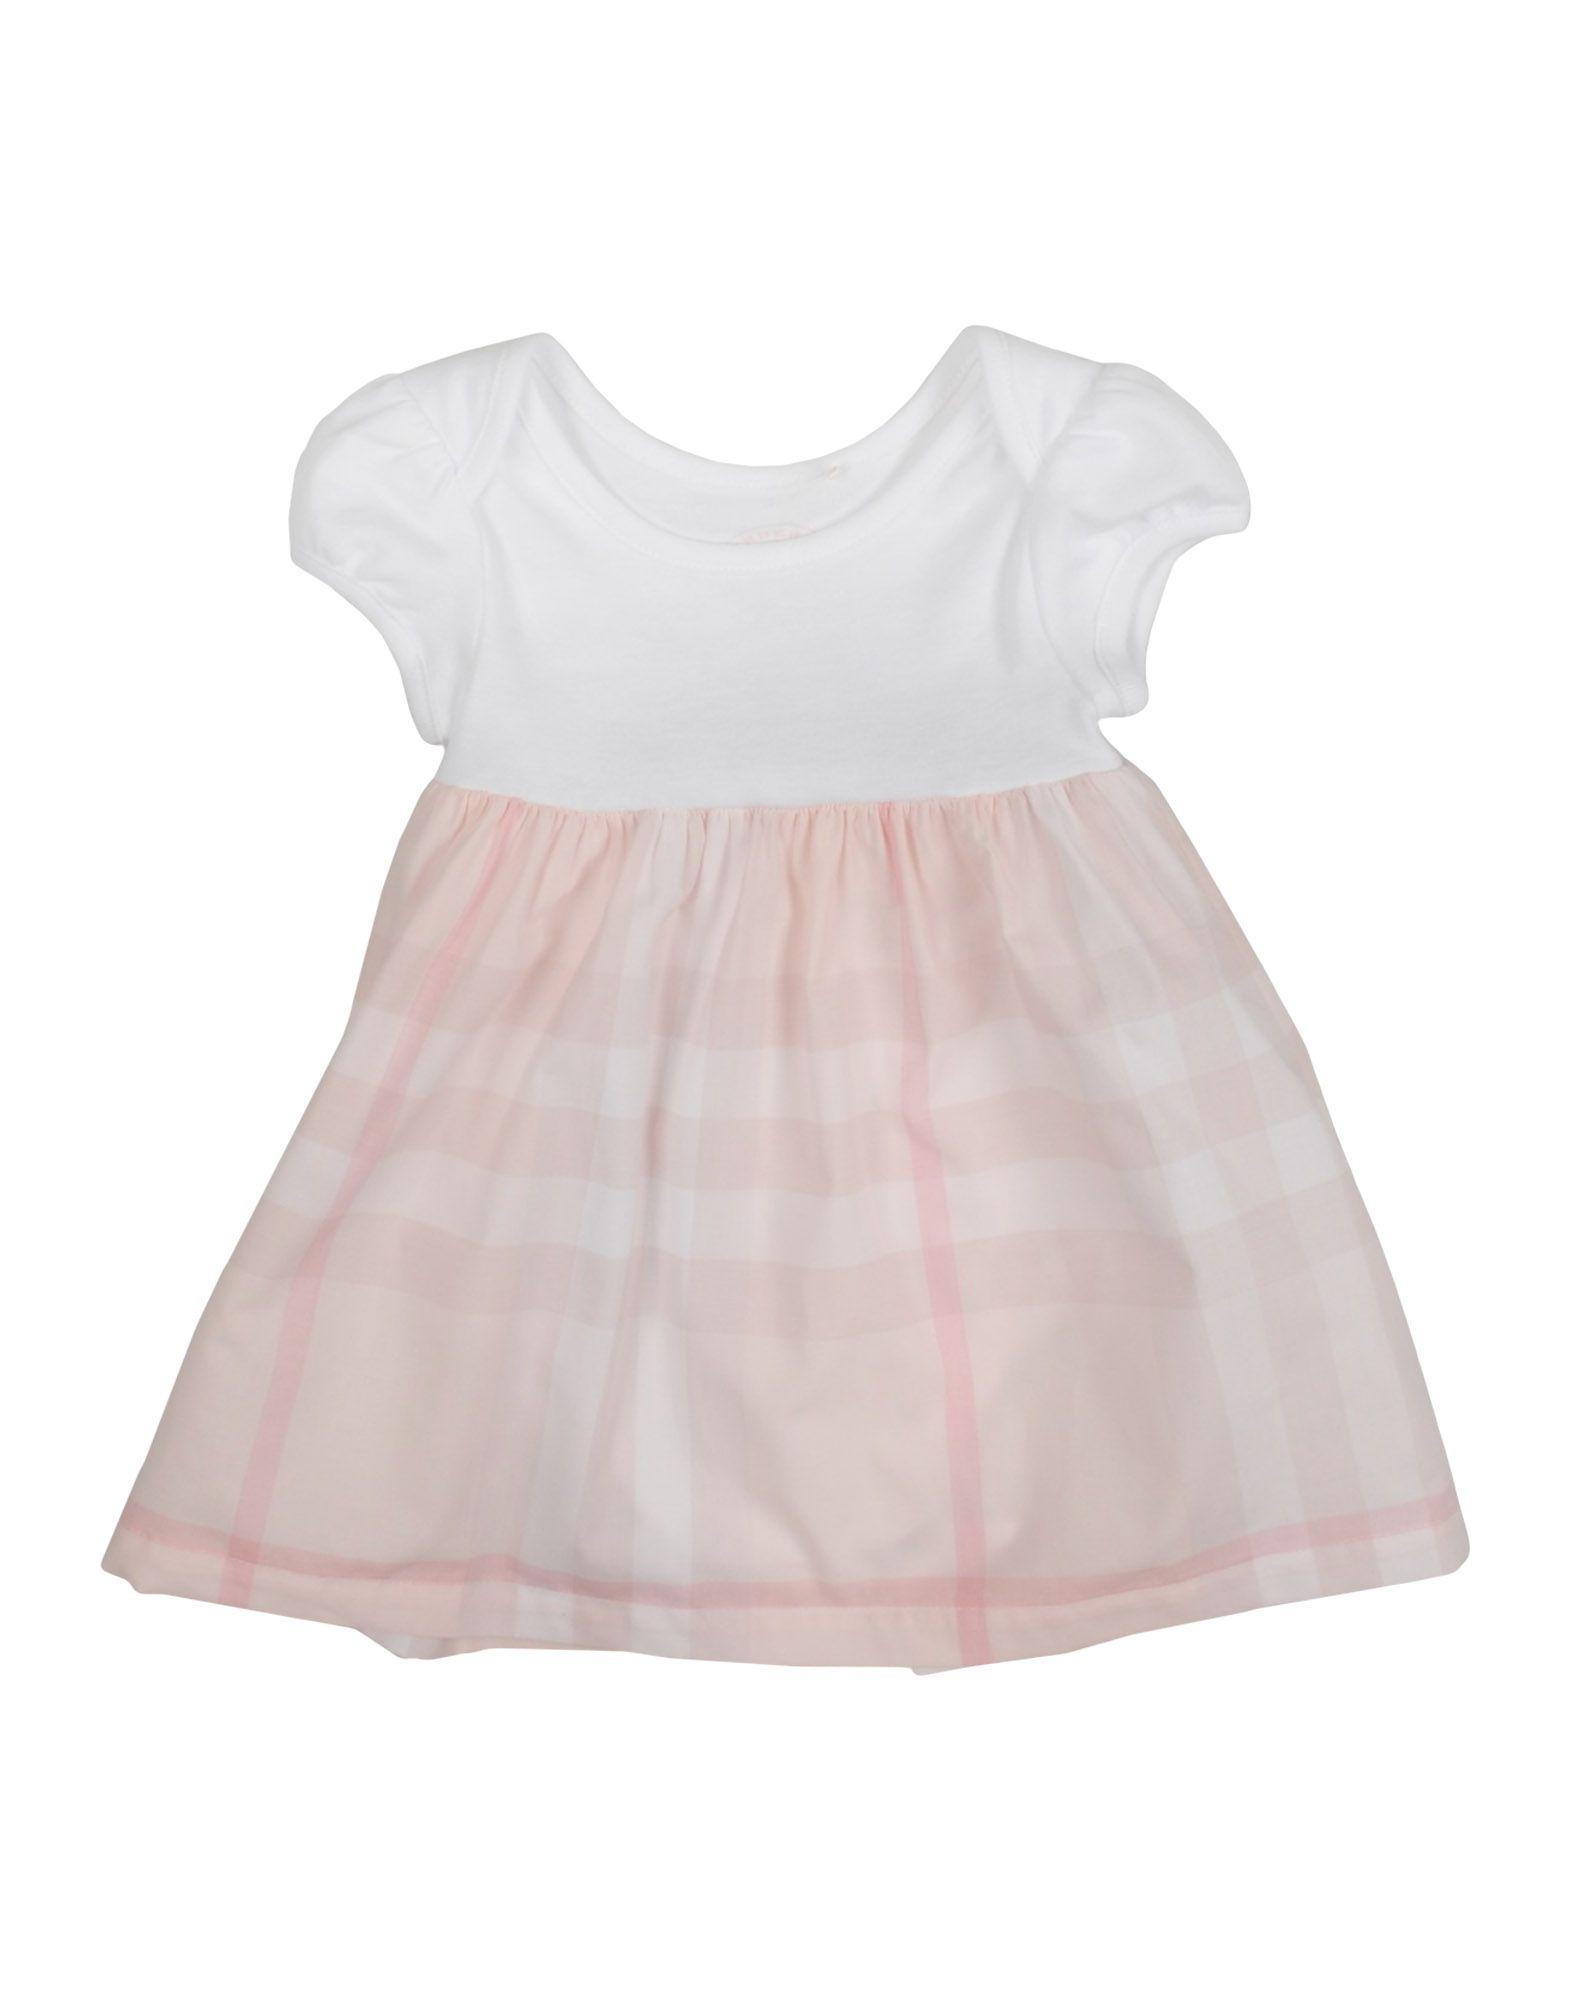 Burberry Dress Girl 0 24 months online on YOOX Poland